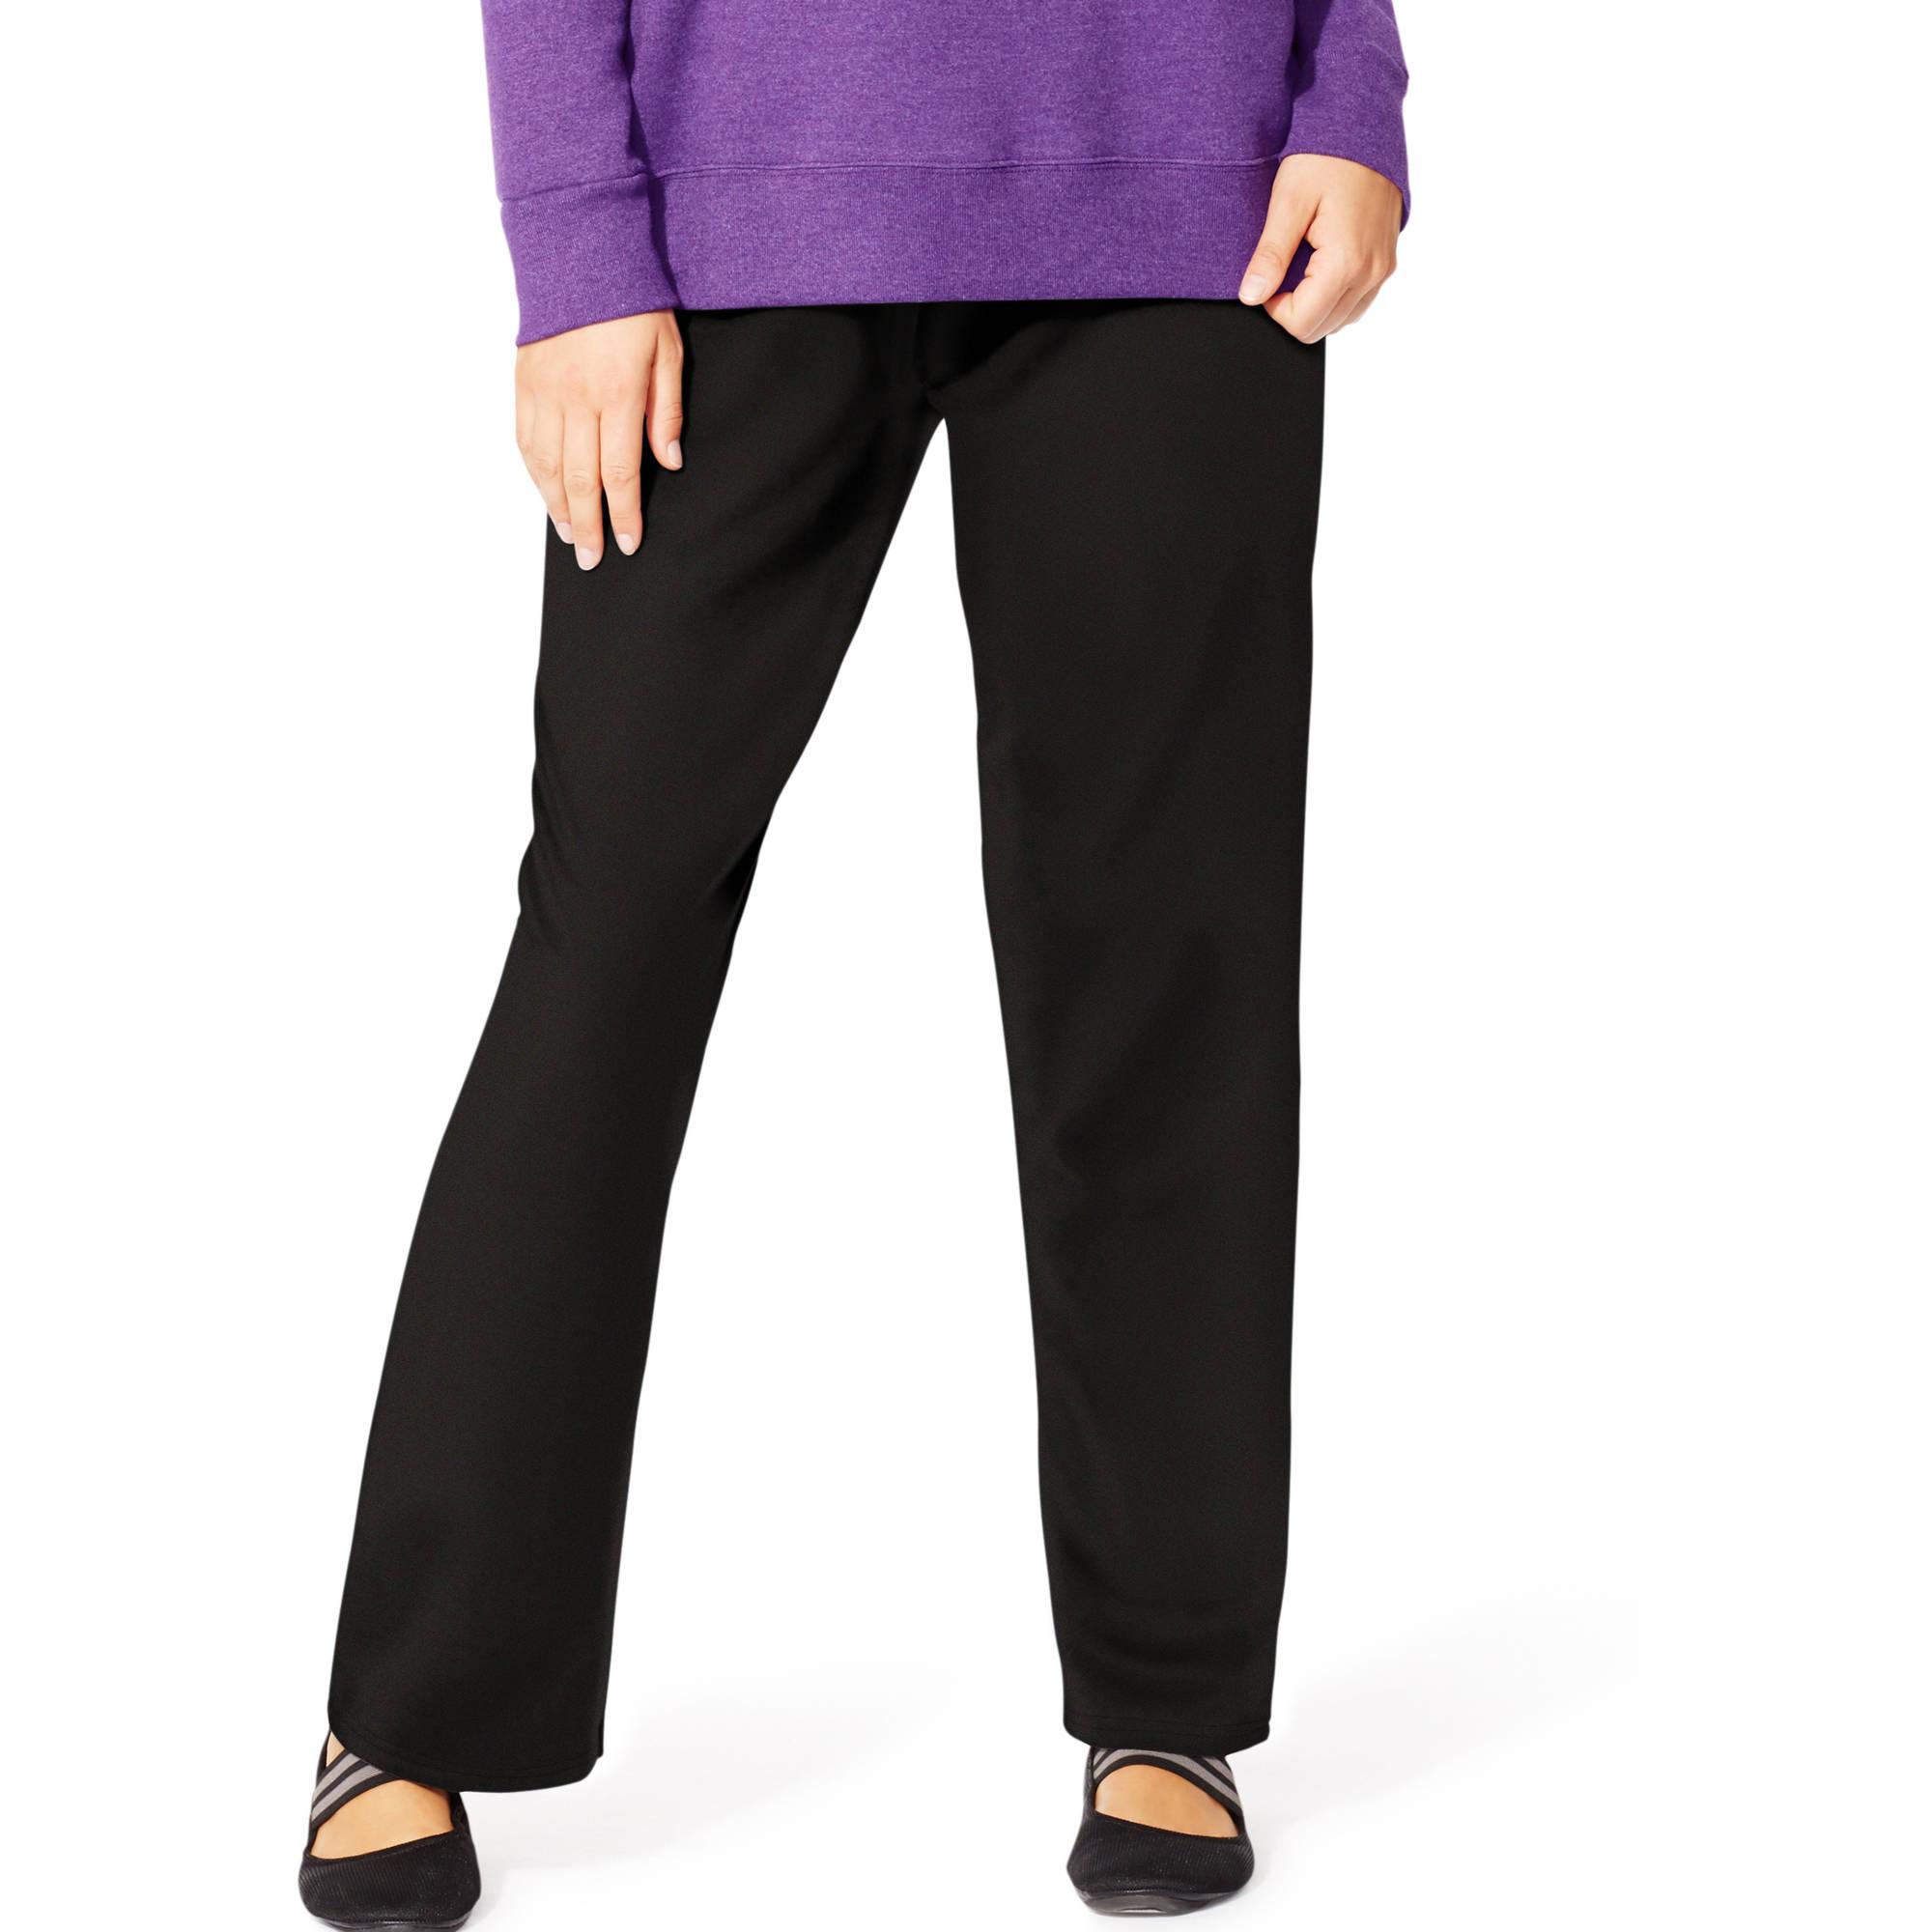 Just My Size Women's Plus-Size Fleece Sweatpants, Petite